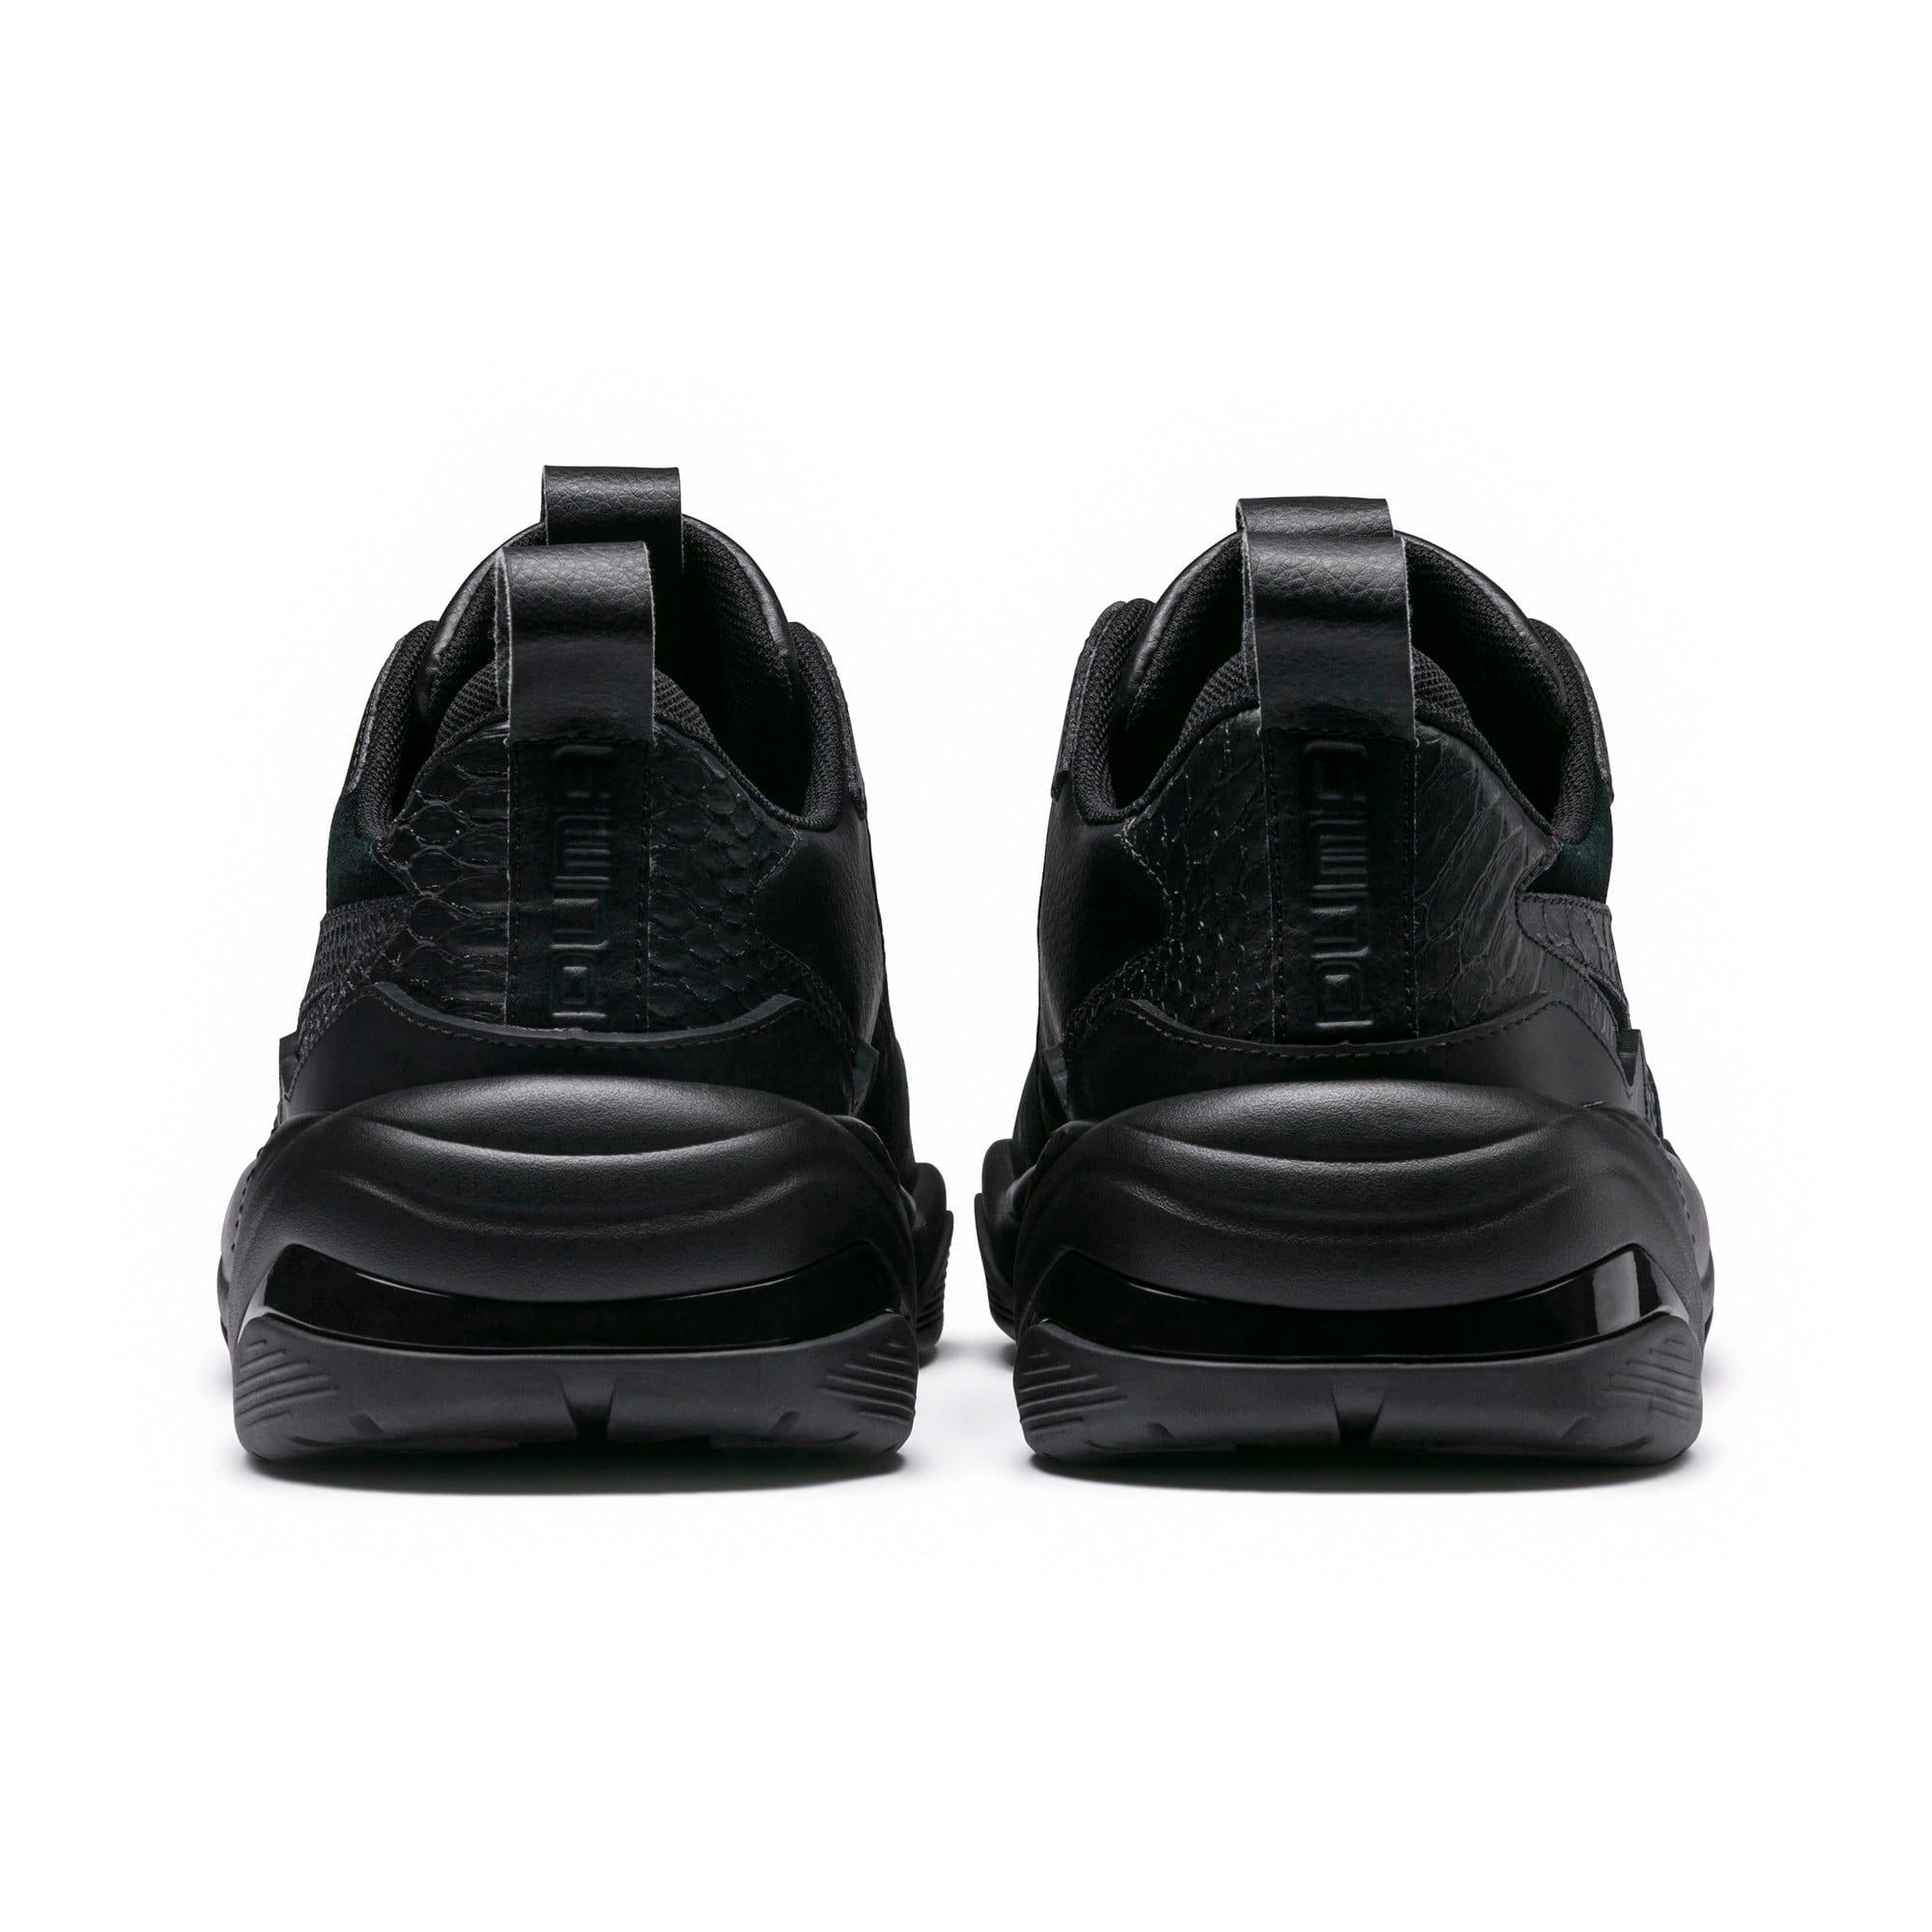 Thumbnail 4 of Thunder Desert Sneakers, Black-Puma Black-Black, medium